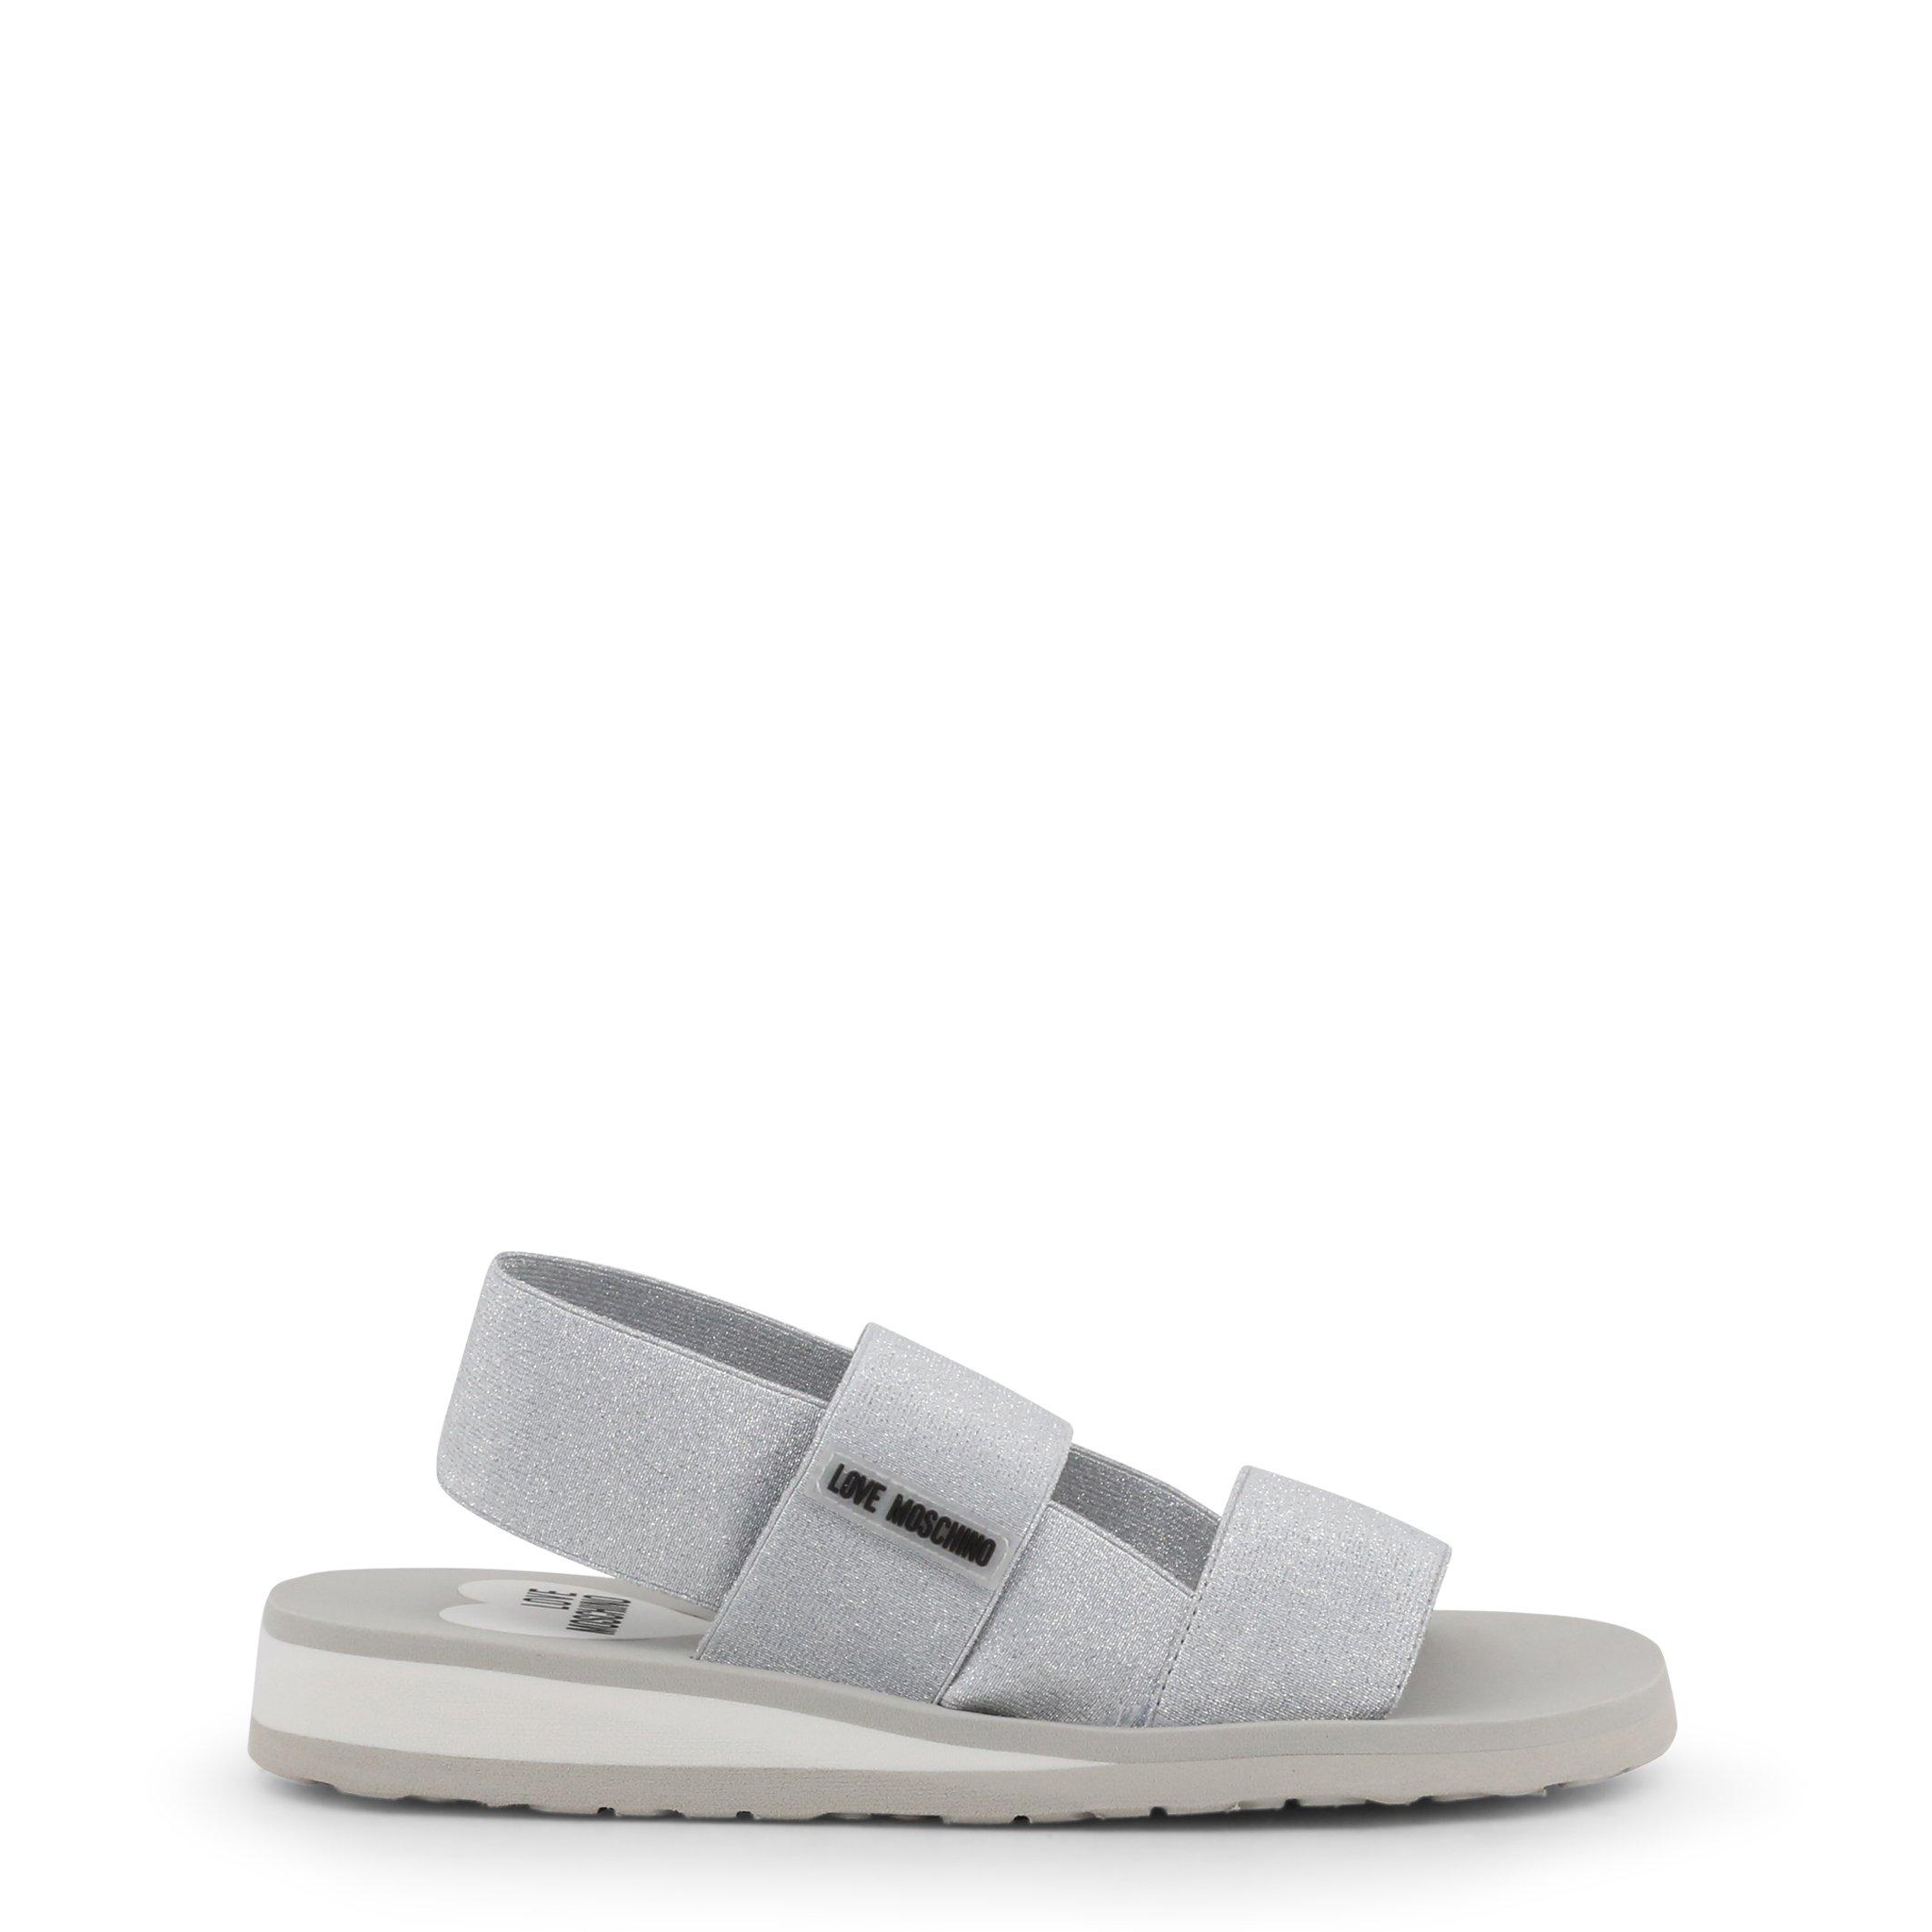 Love Moschino Women's Sandal Various Colours JA16293G07JT - grey EU 36